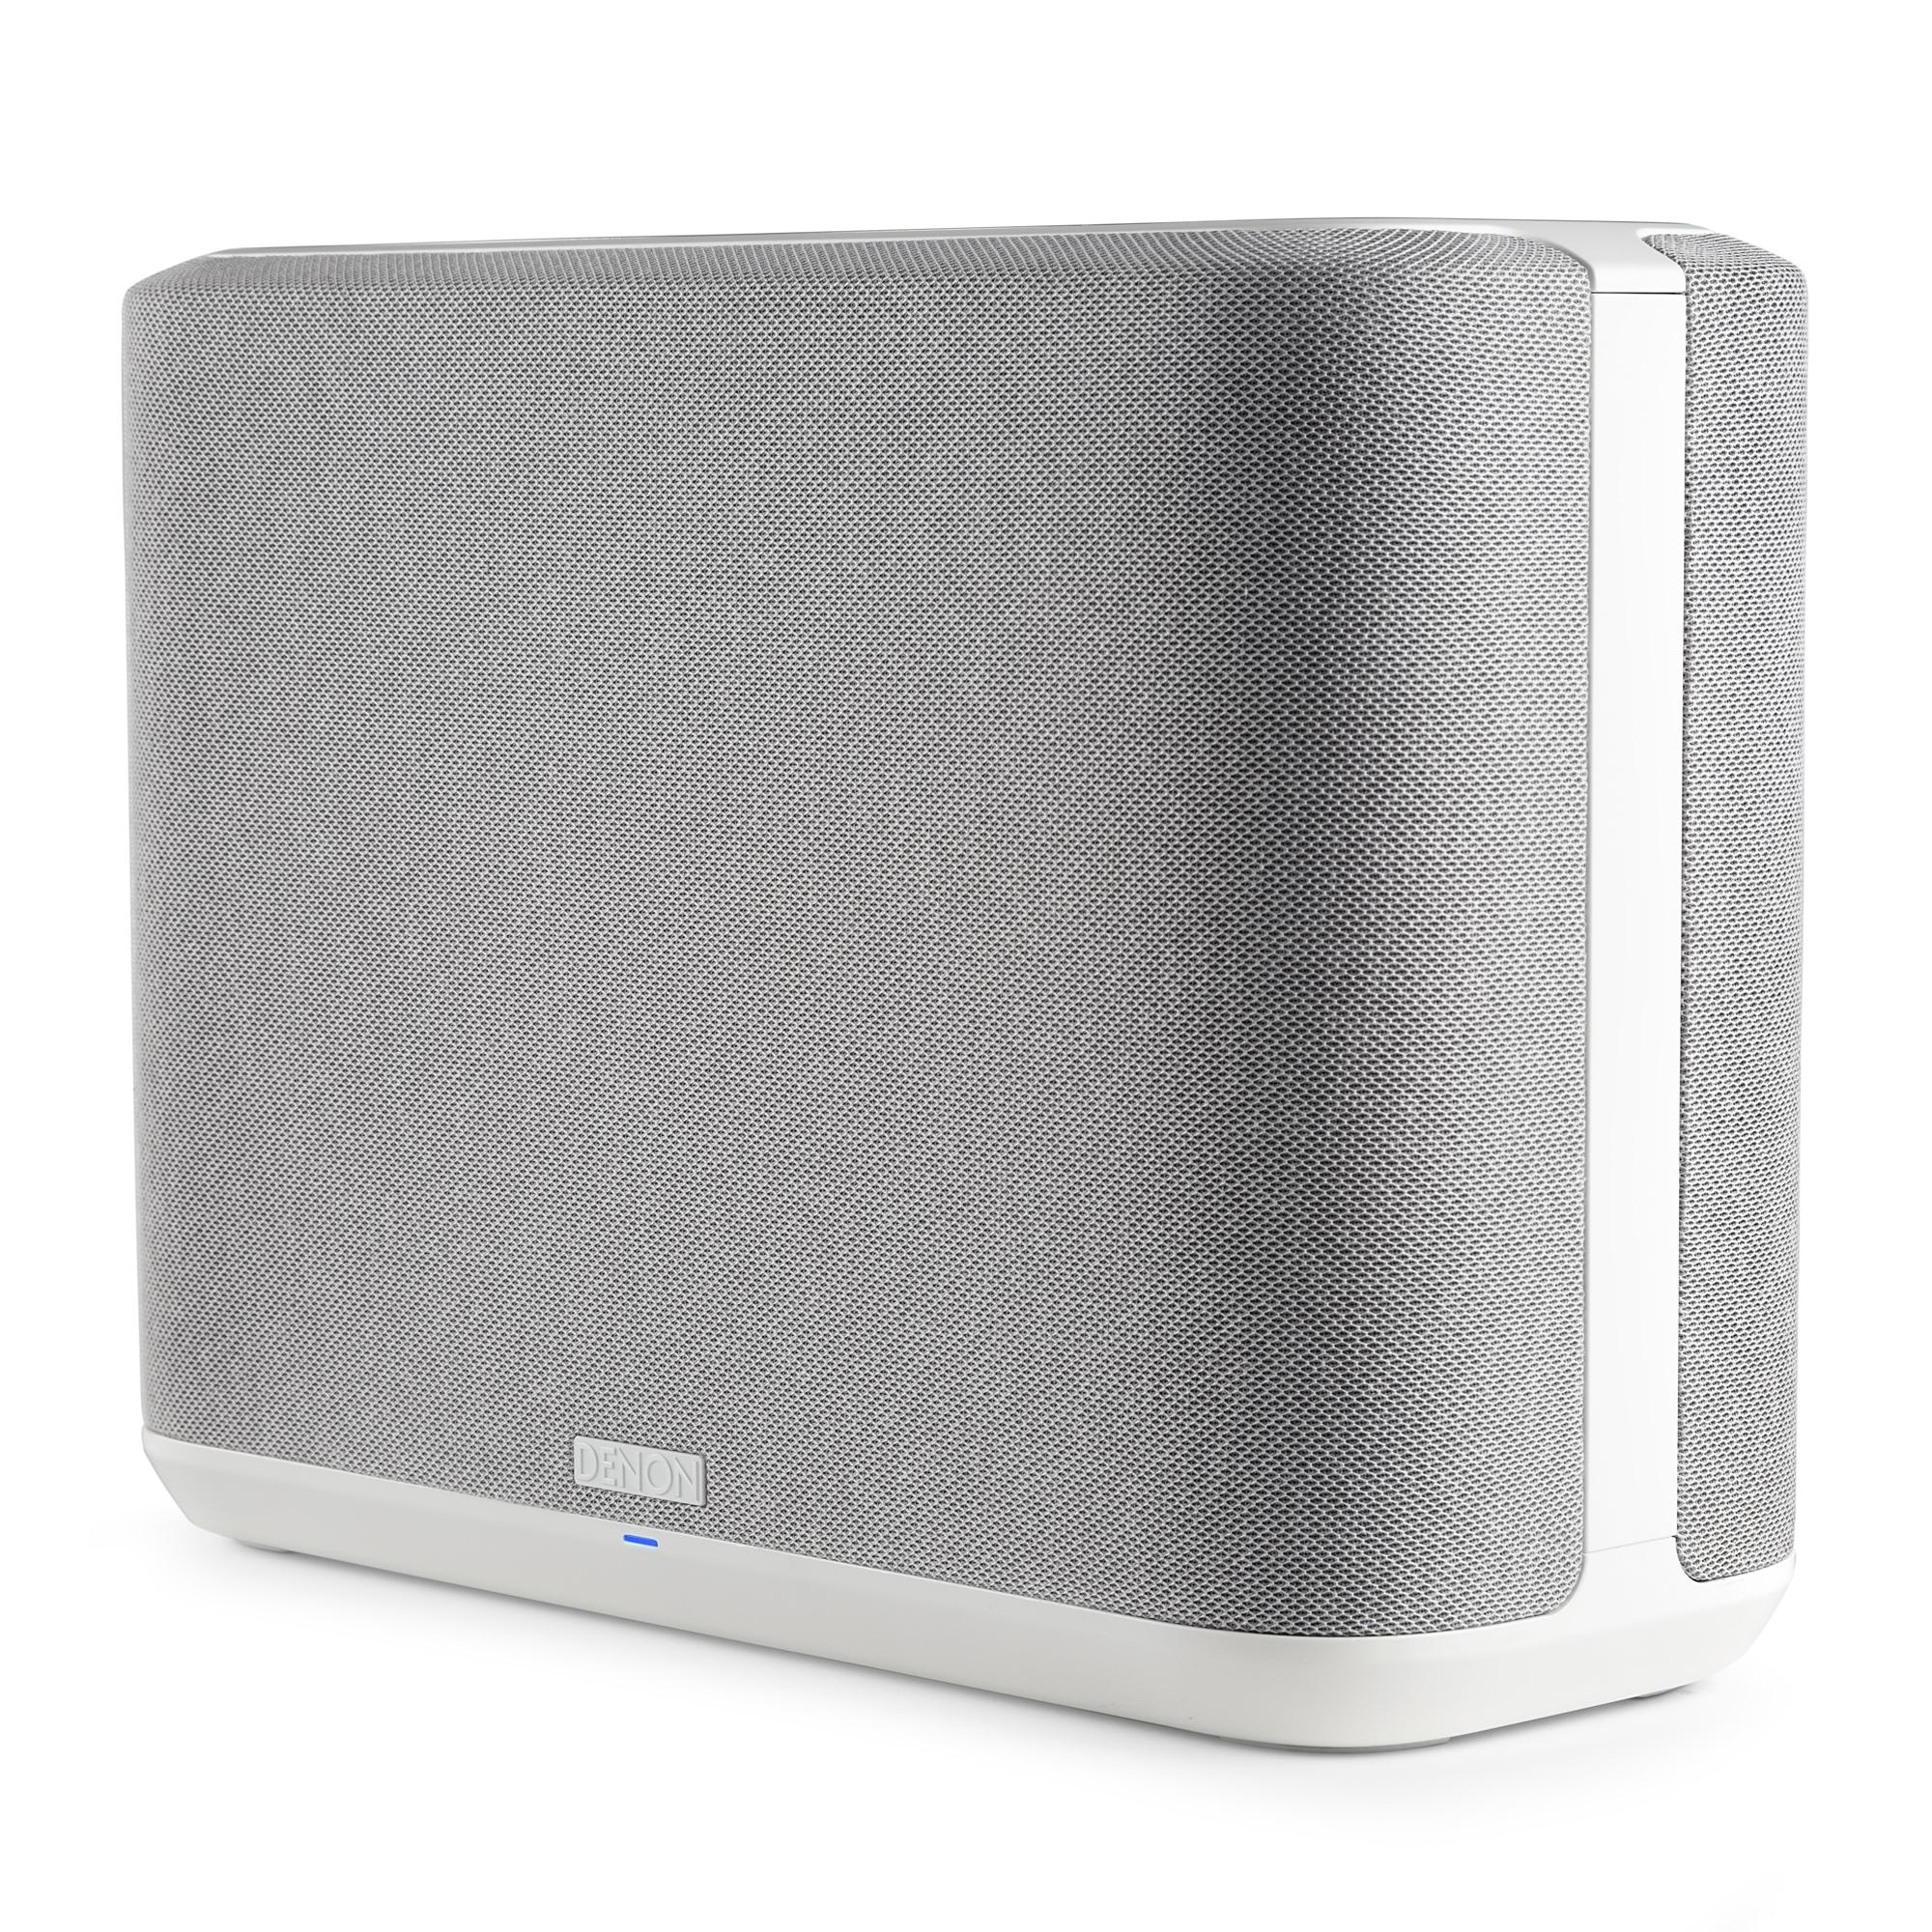 Denon Home 250 weiss Stück Wireless-Lautsprecher 101166